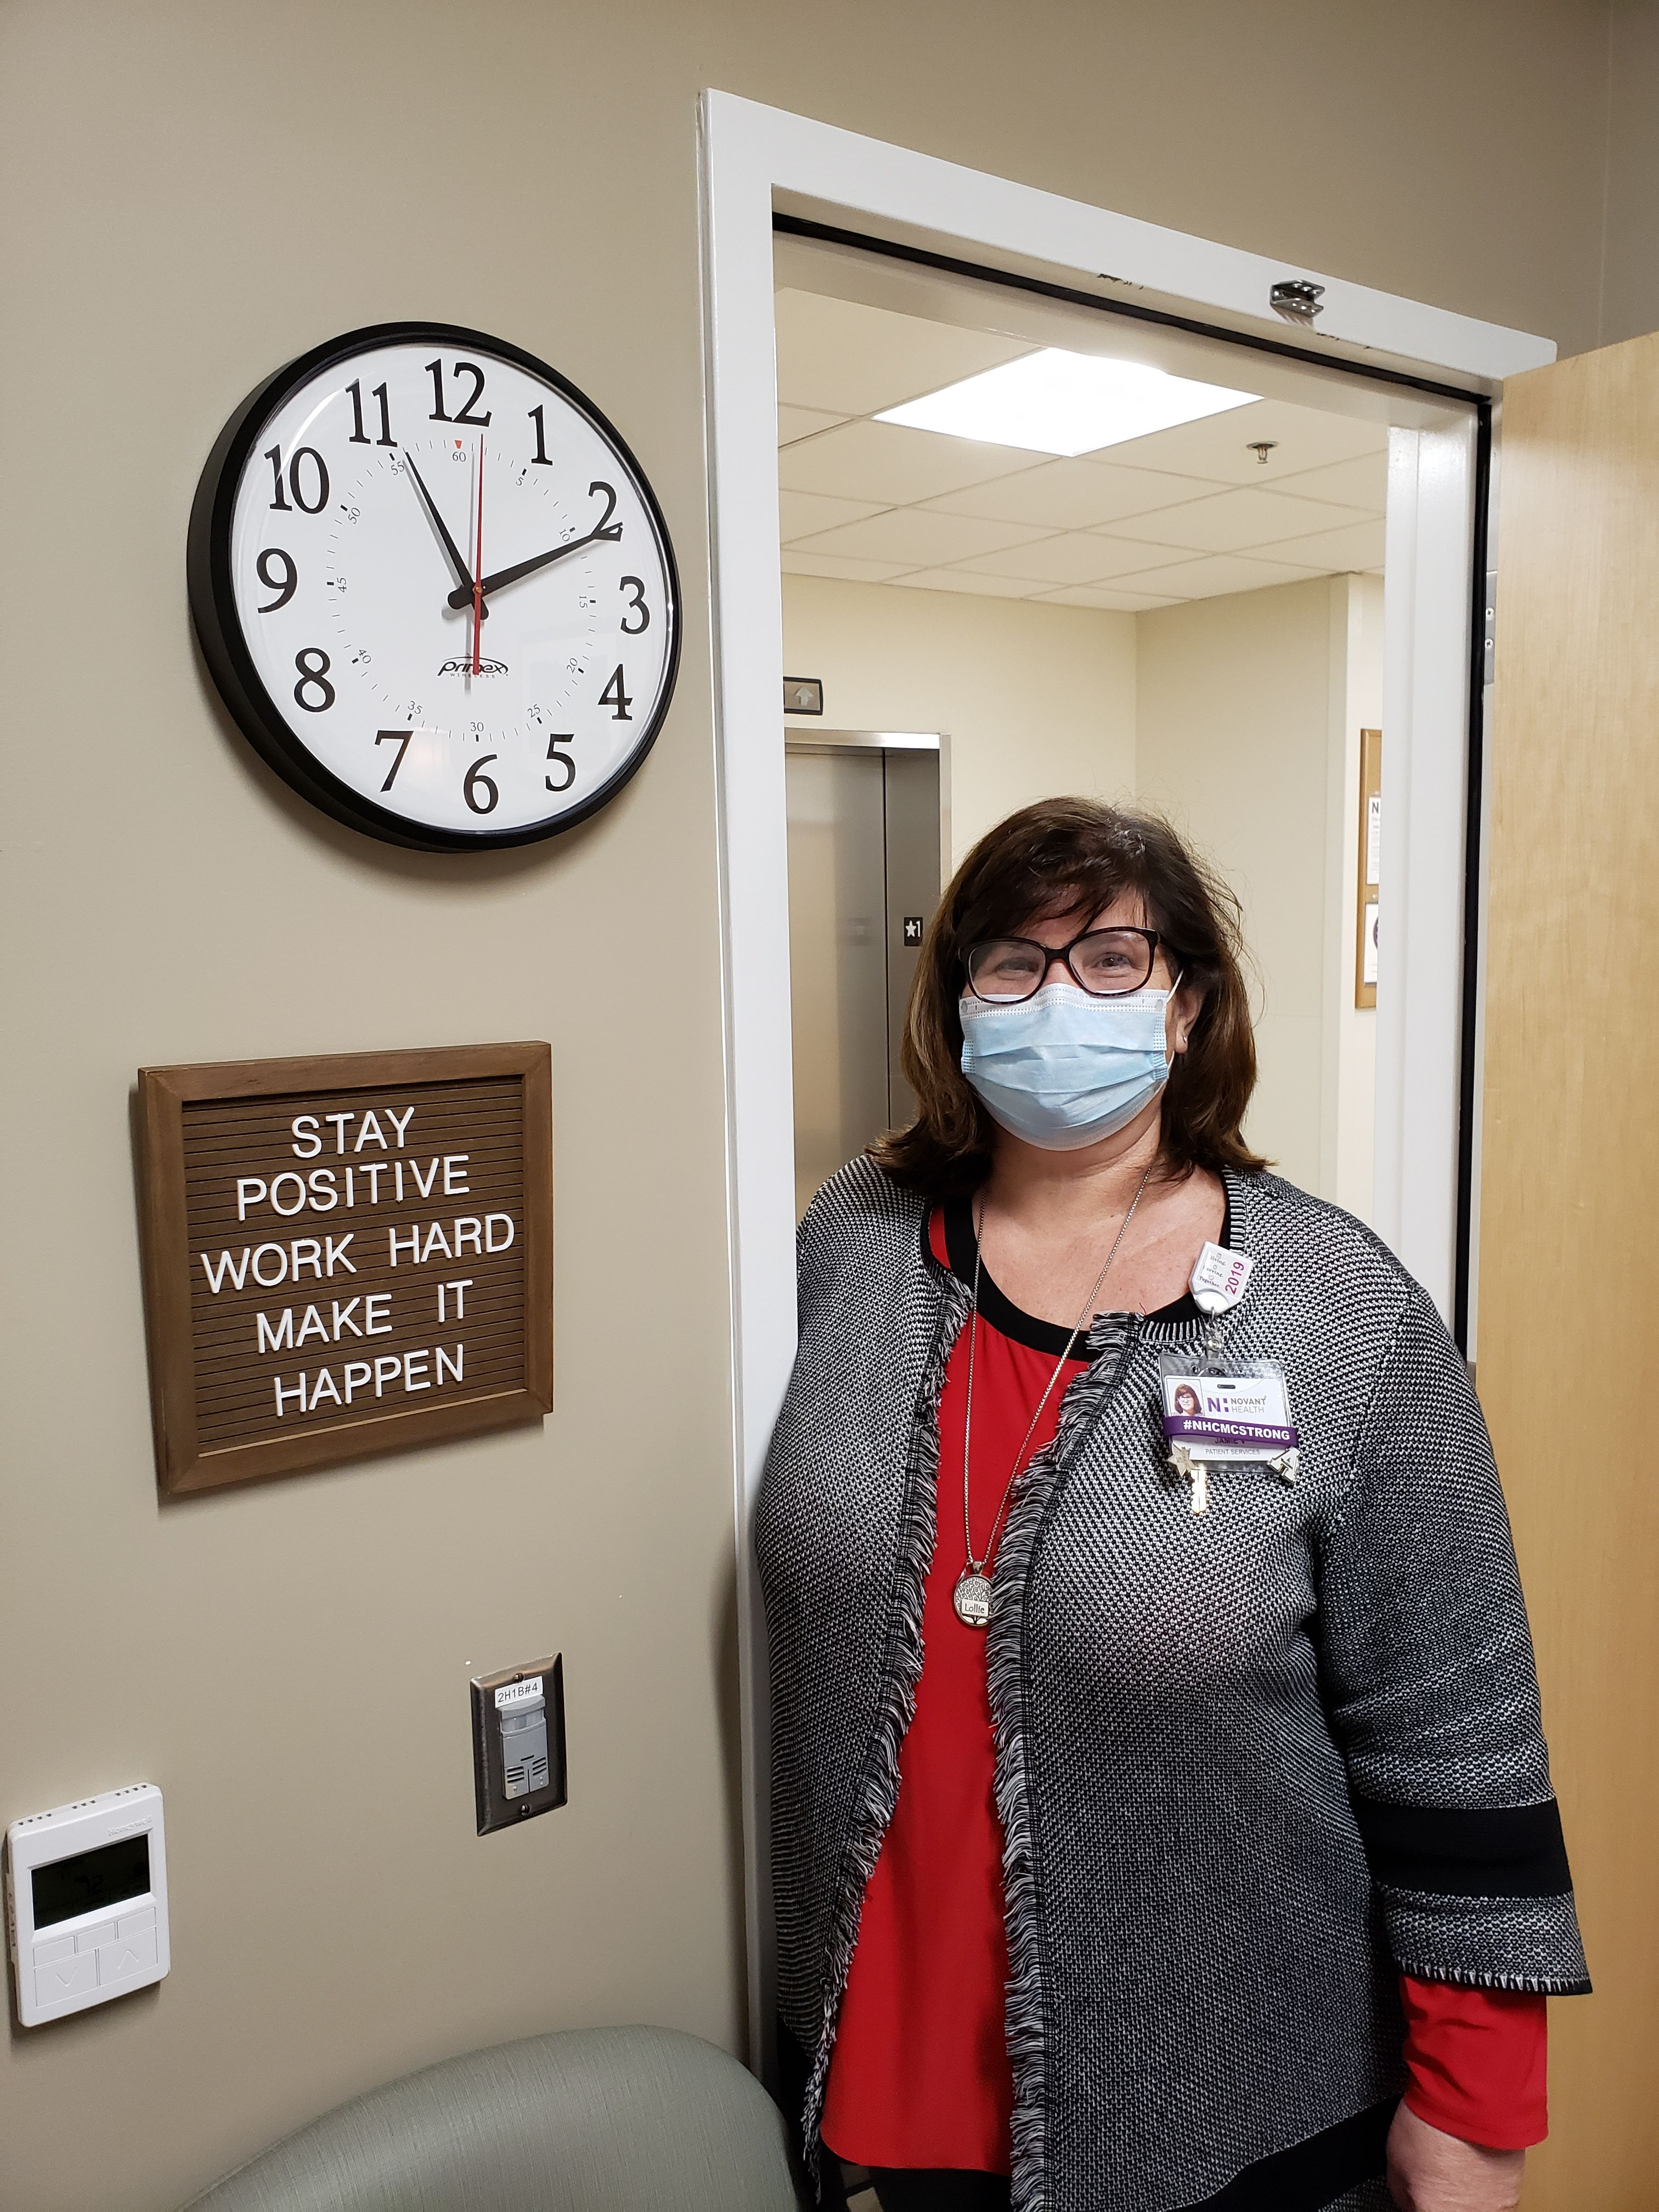 Jamie Vogler with her office sign